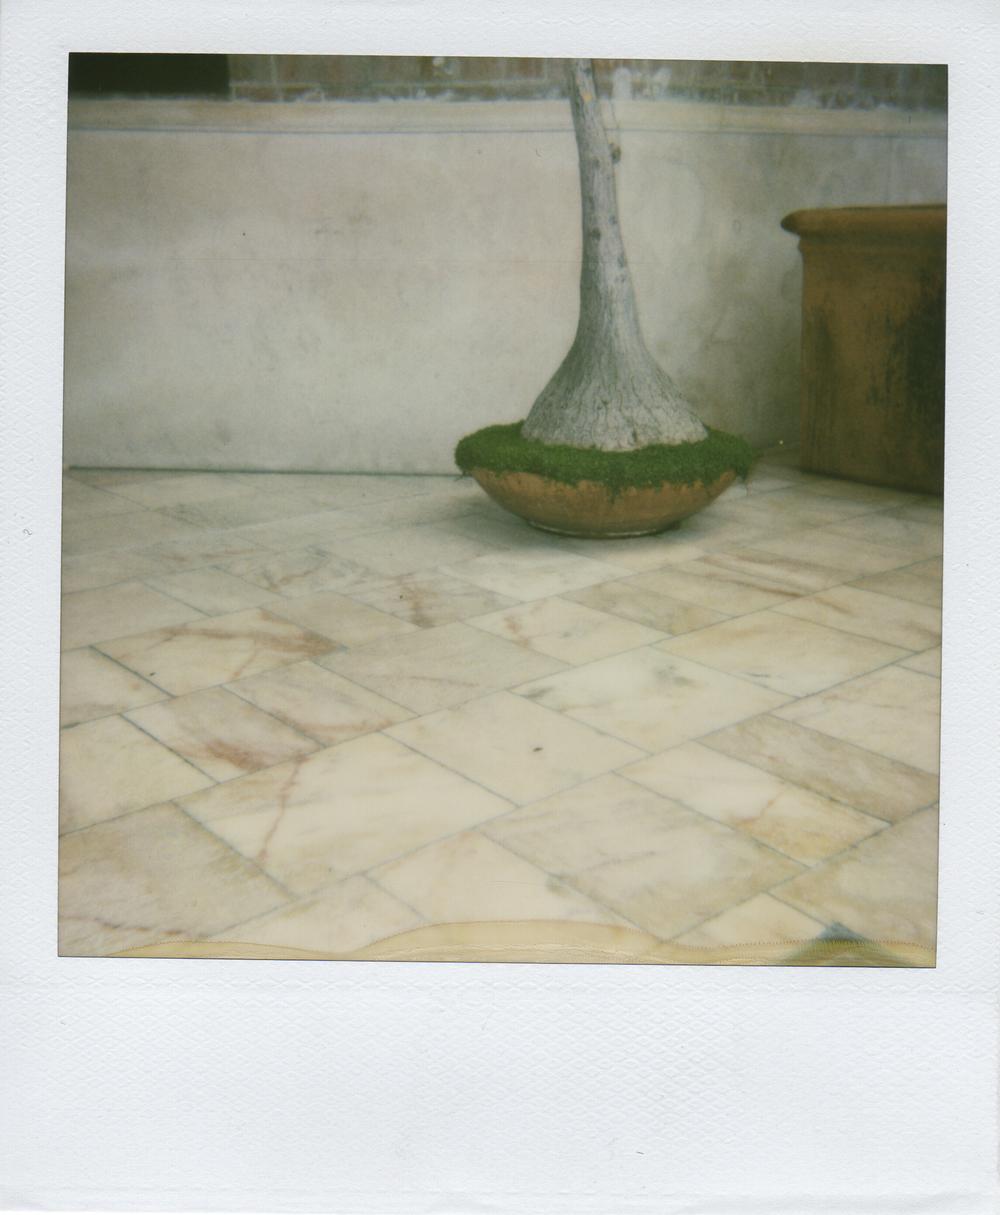 jlaurence-polaroid-046.jpg